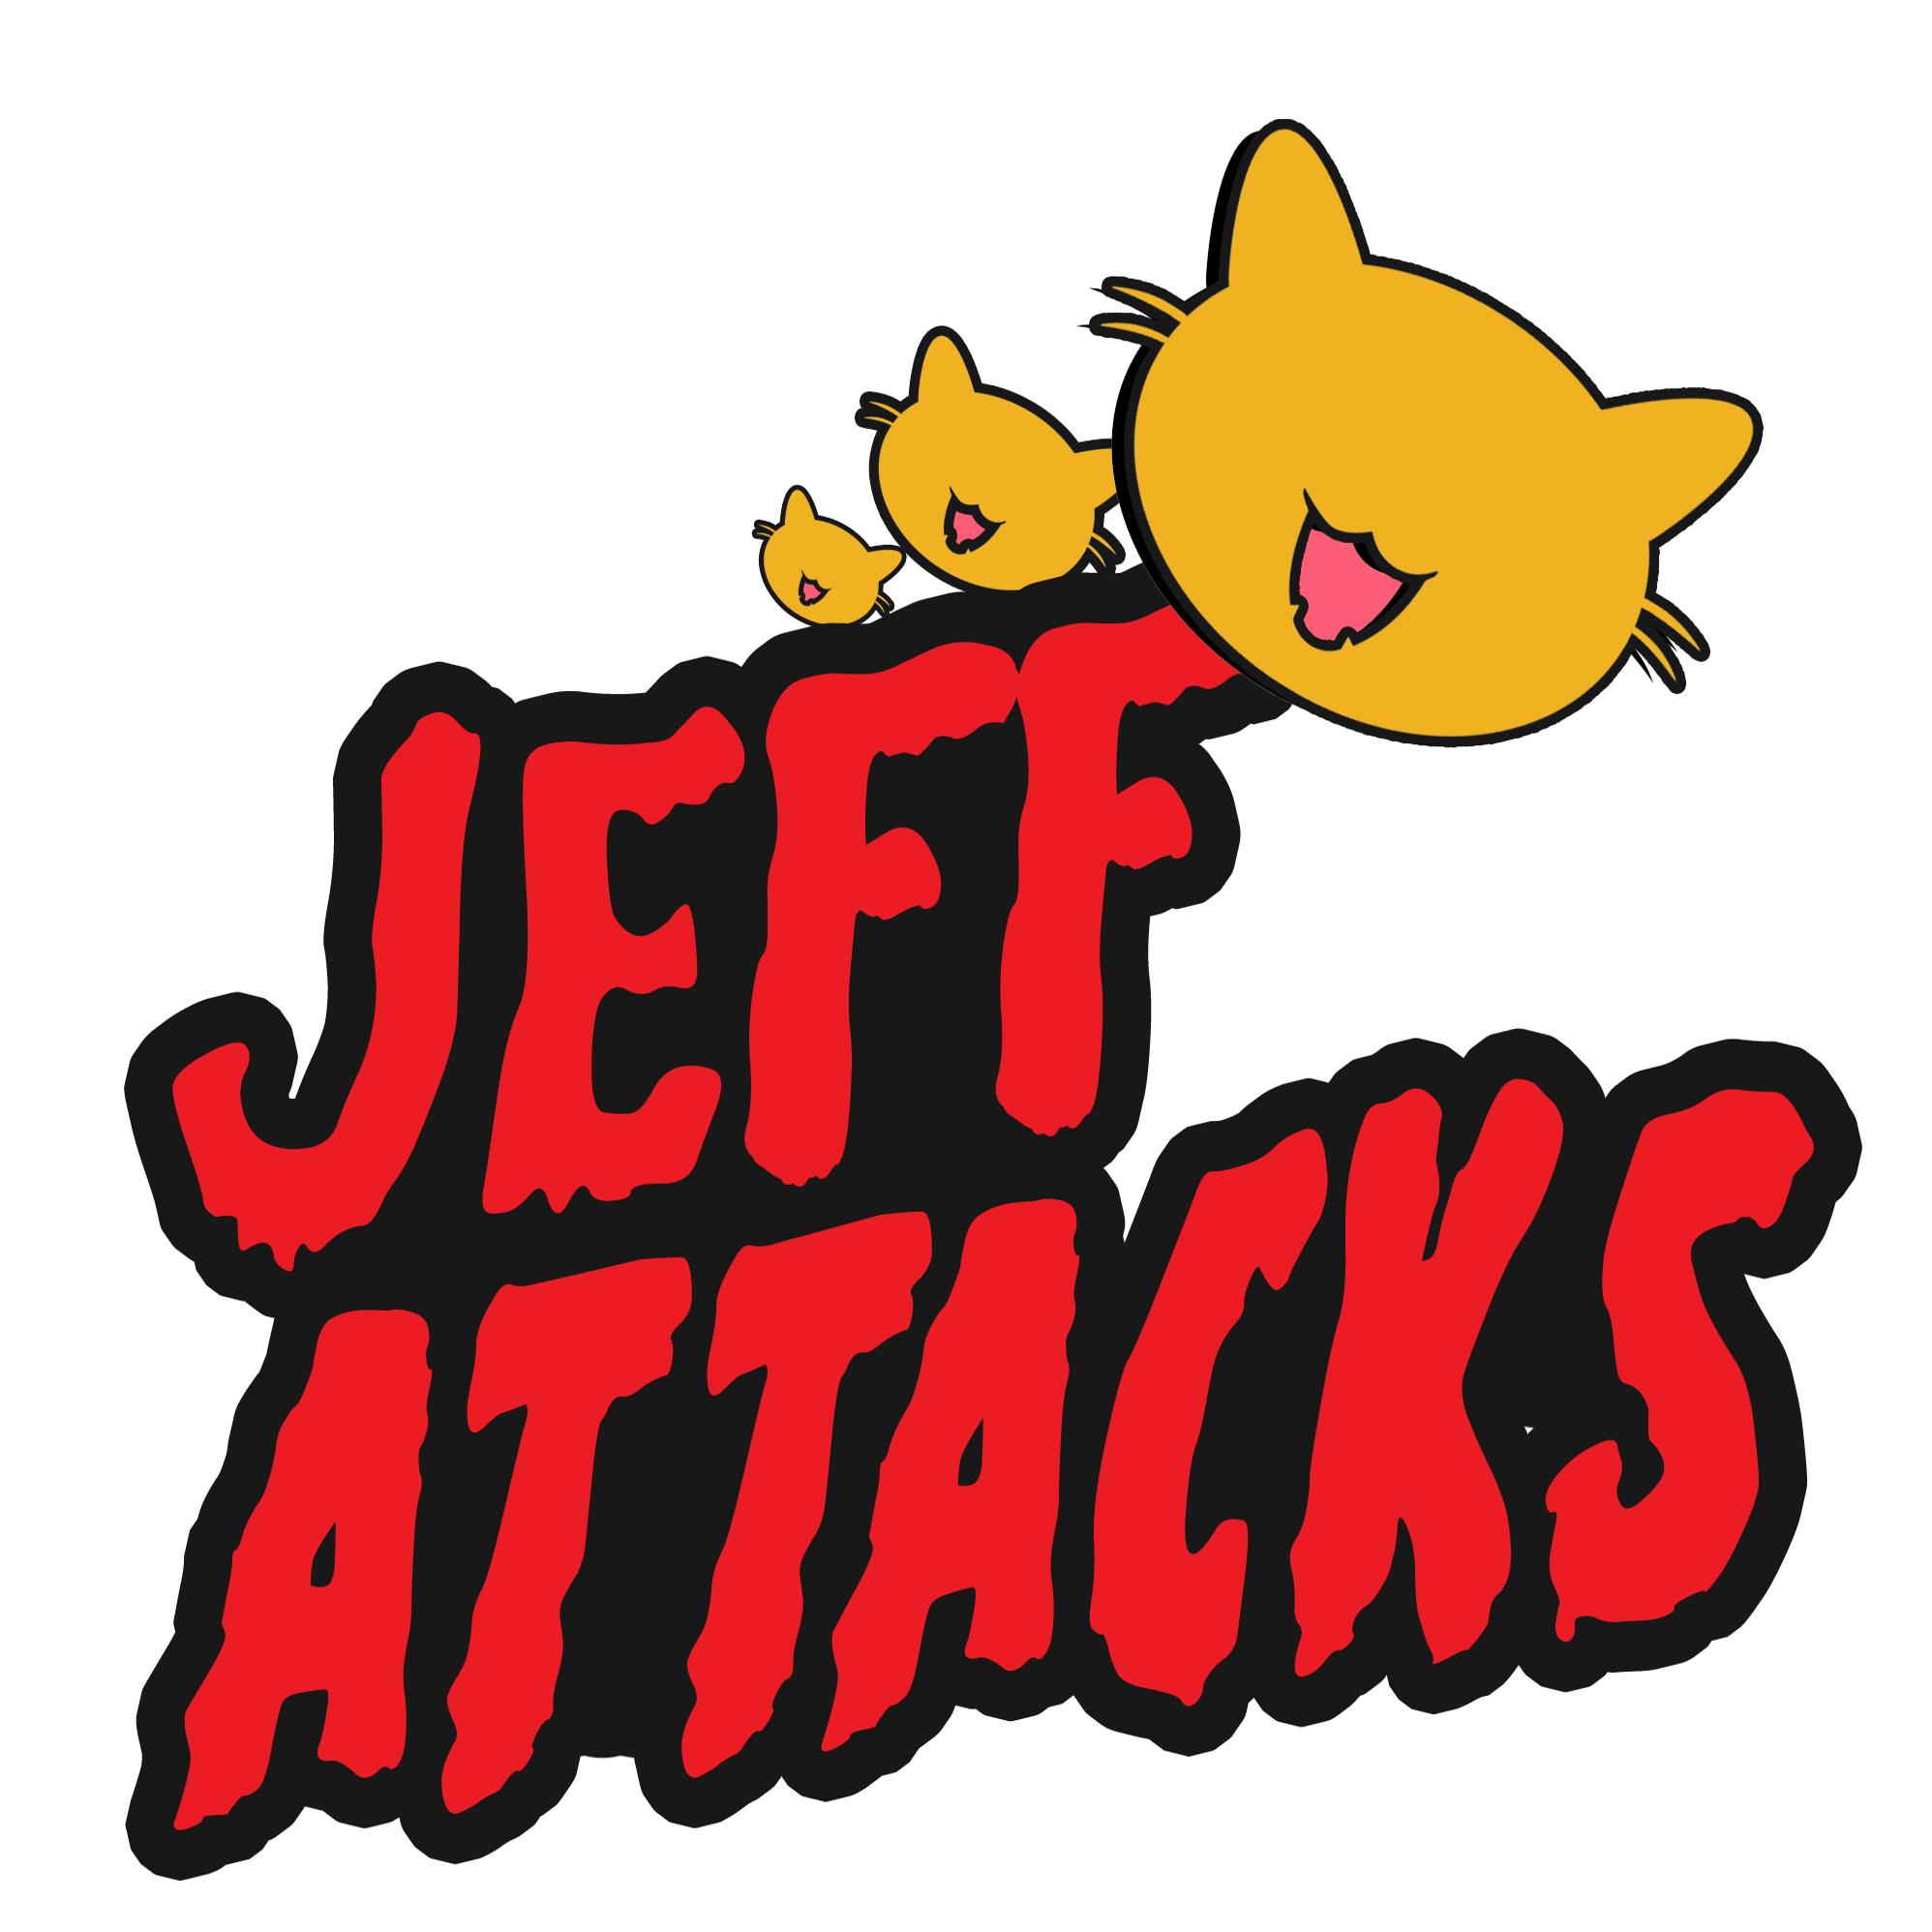 Jeff Attacks!